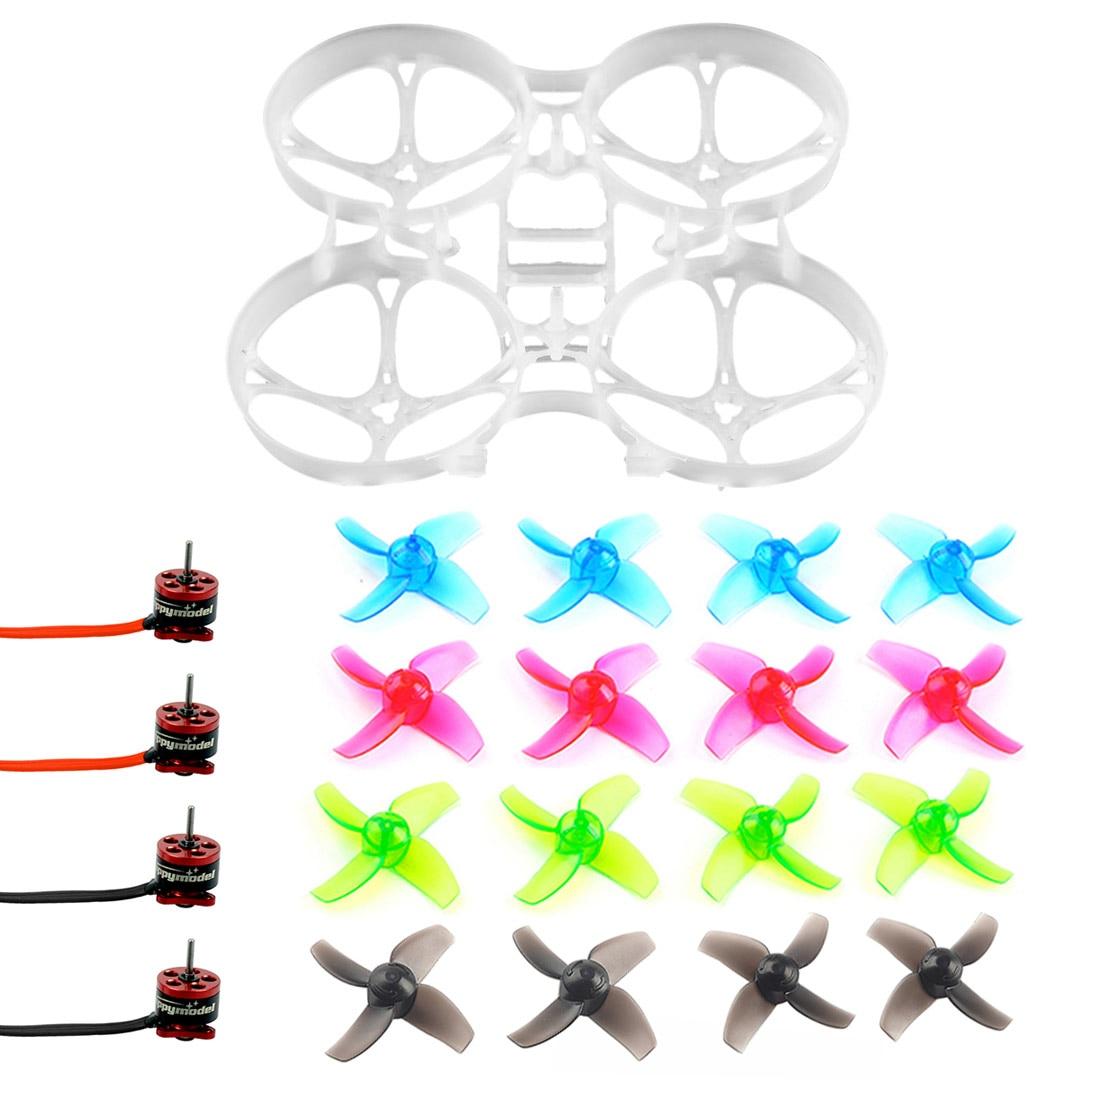 DIY Mobula 7 V3 FPV Drone Parts Frame